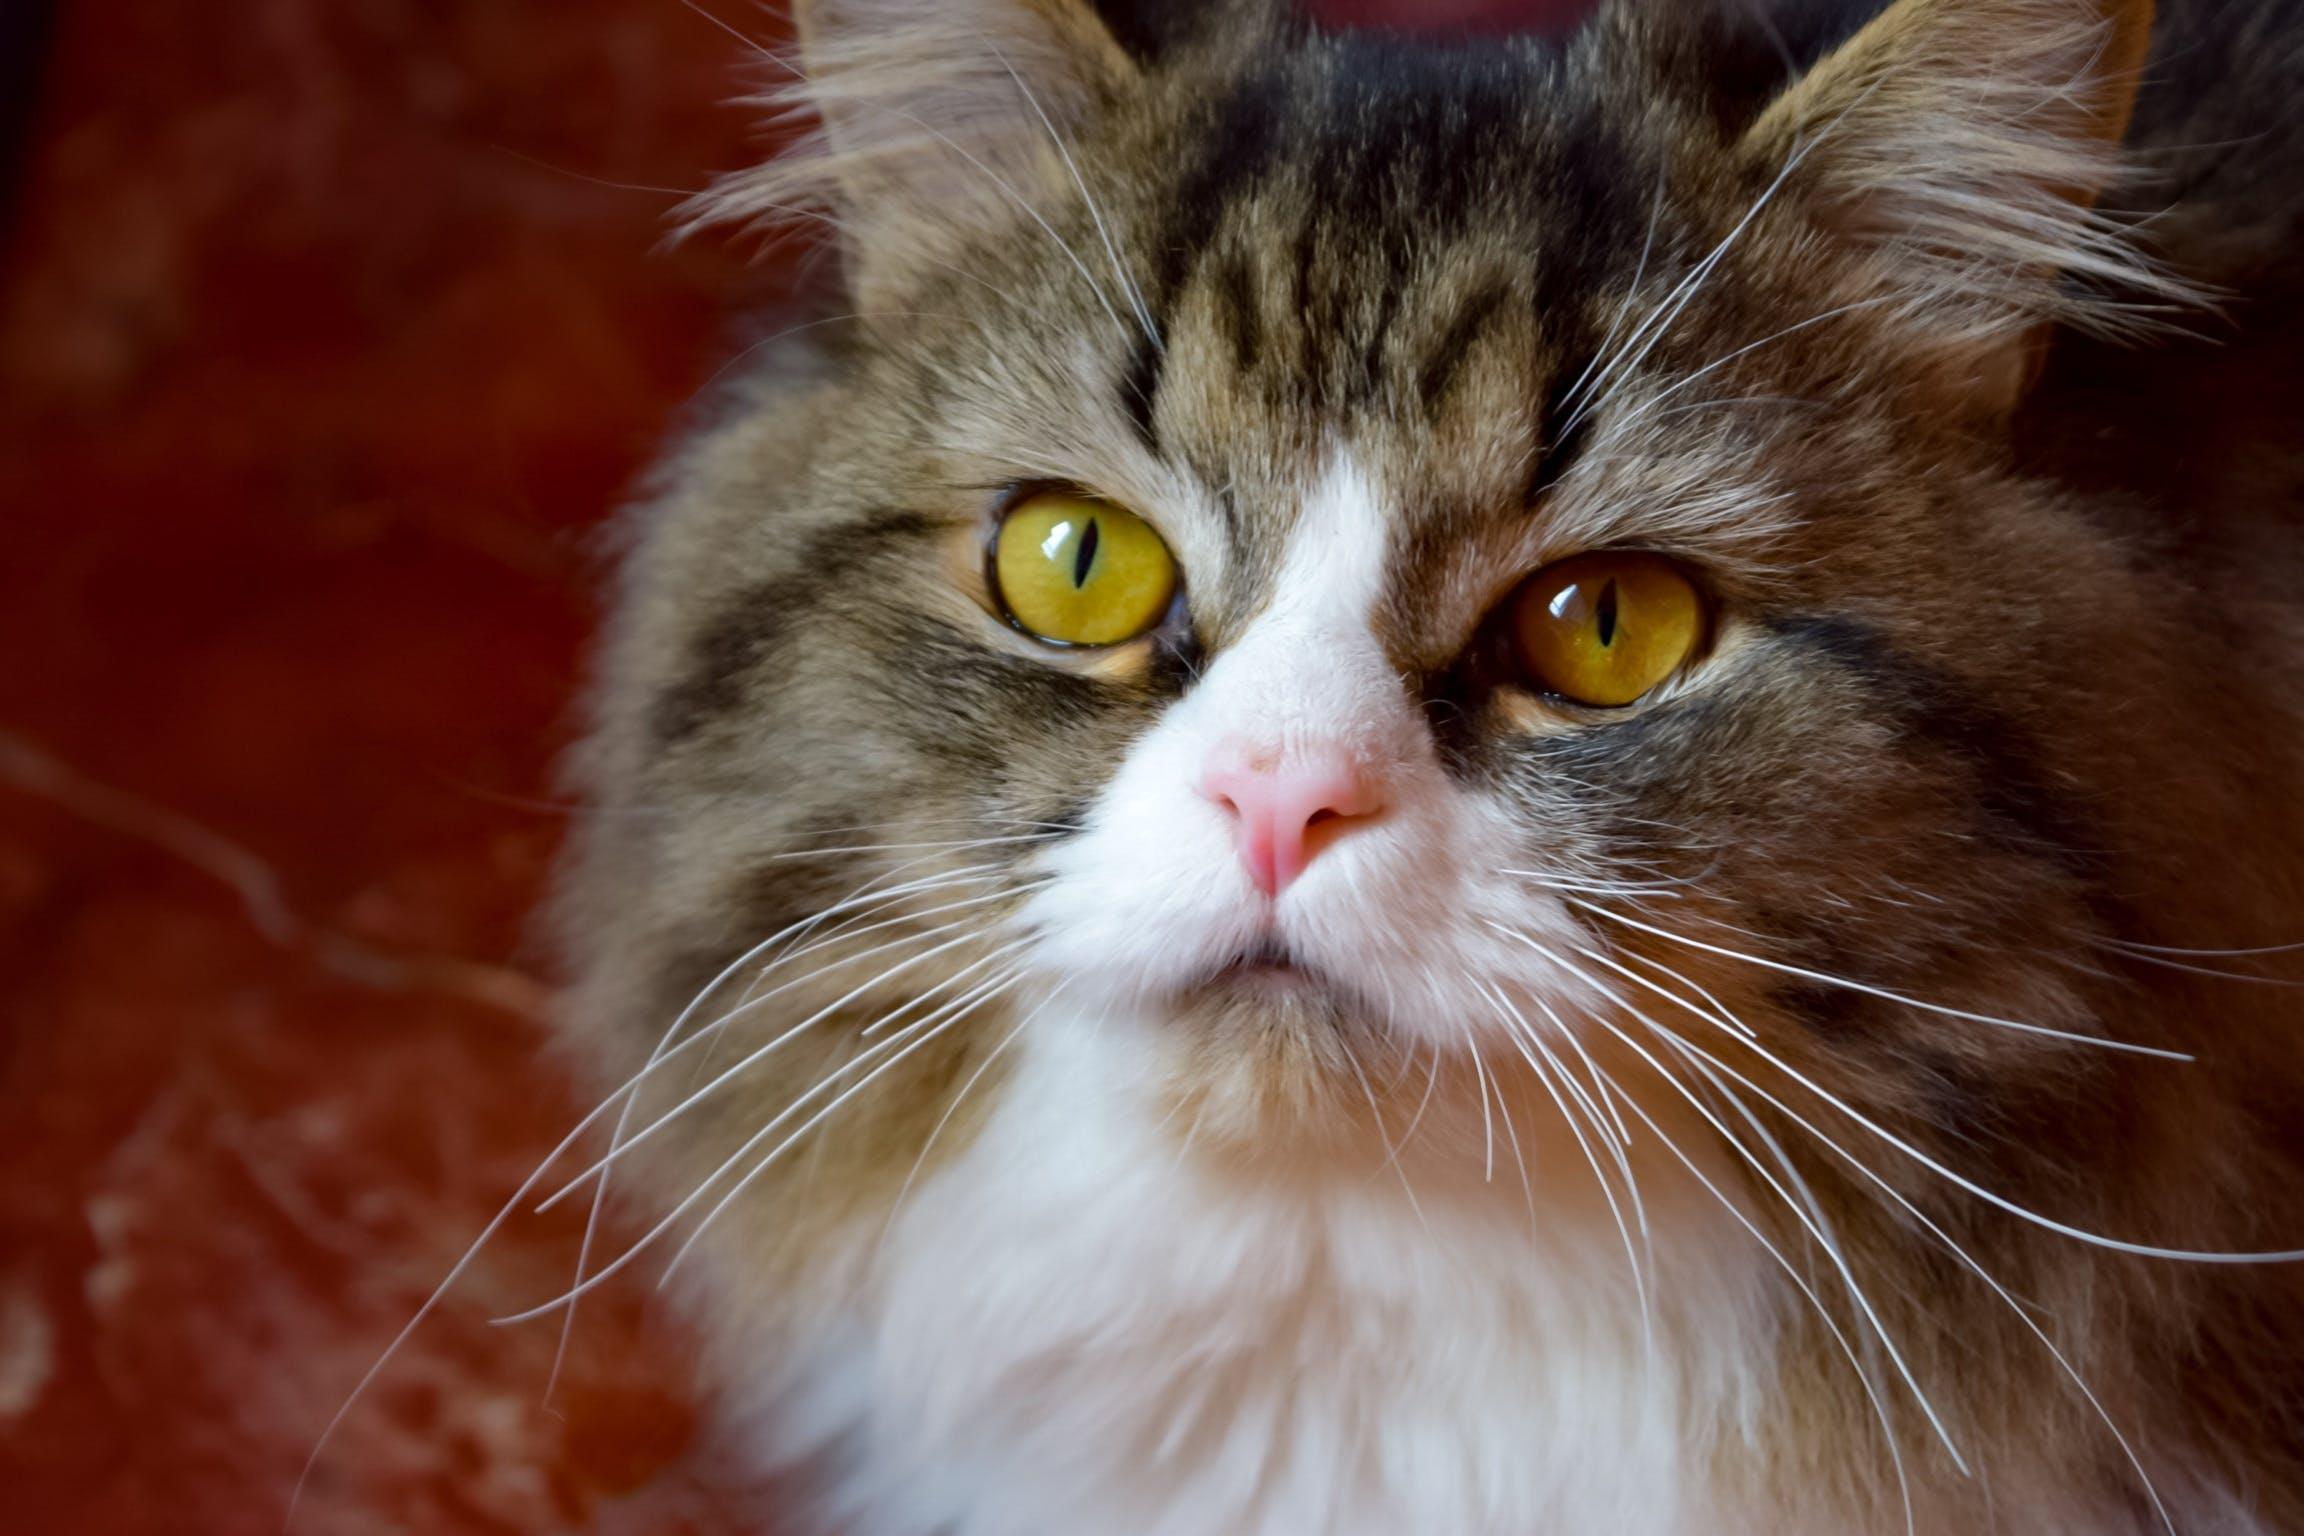 big eyes, cat face, lovely cat